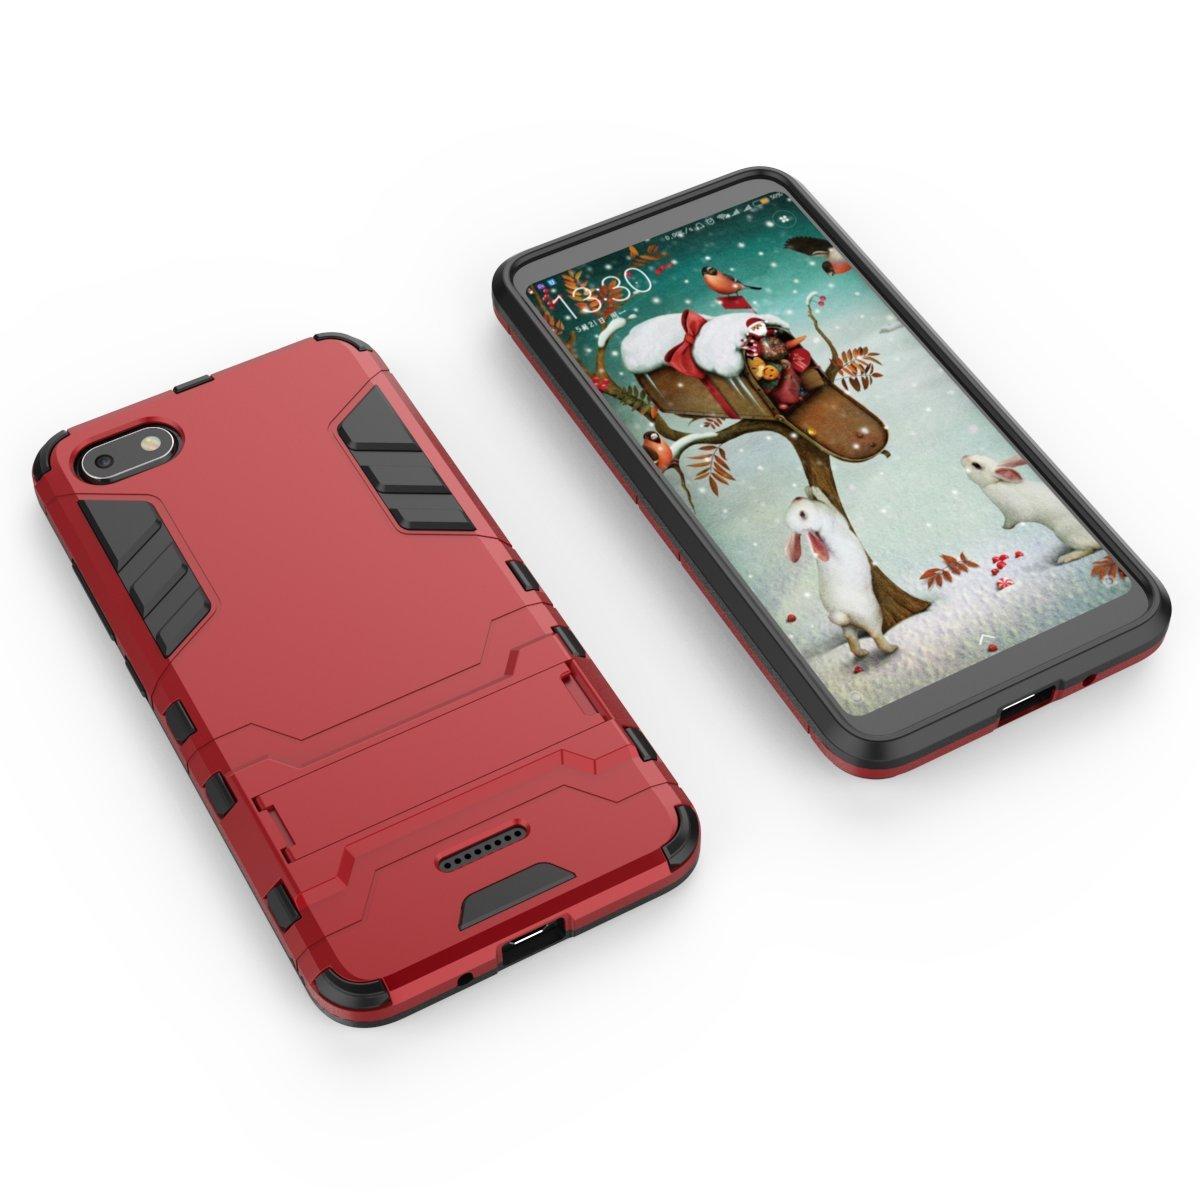 HDRUN Funda Xiaomi Mi 9-2in1 Duro PC Rojo Suave TPU Silicona Dual Layer Hybrid High Absorci/ón de Impacto con Soporte Armadura Carcasa Case para Xiaomi 9